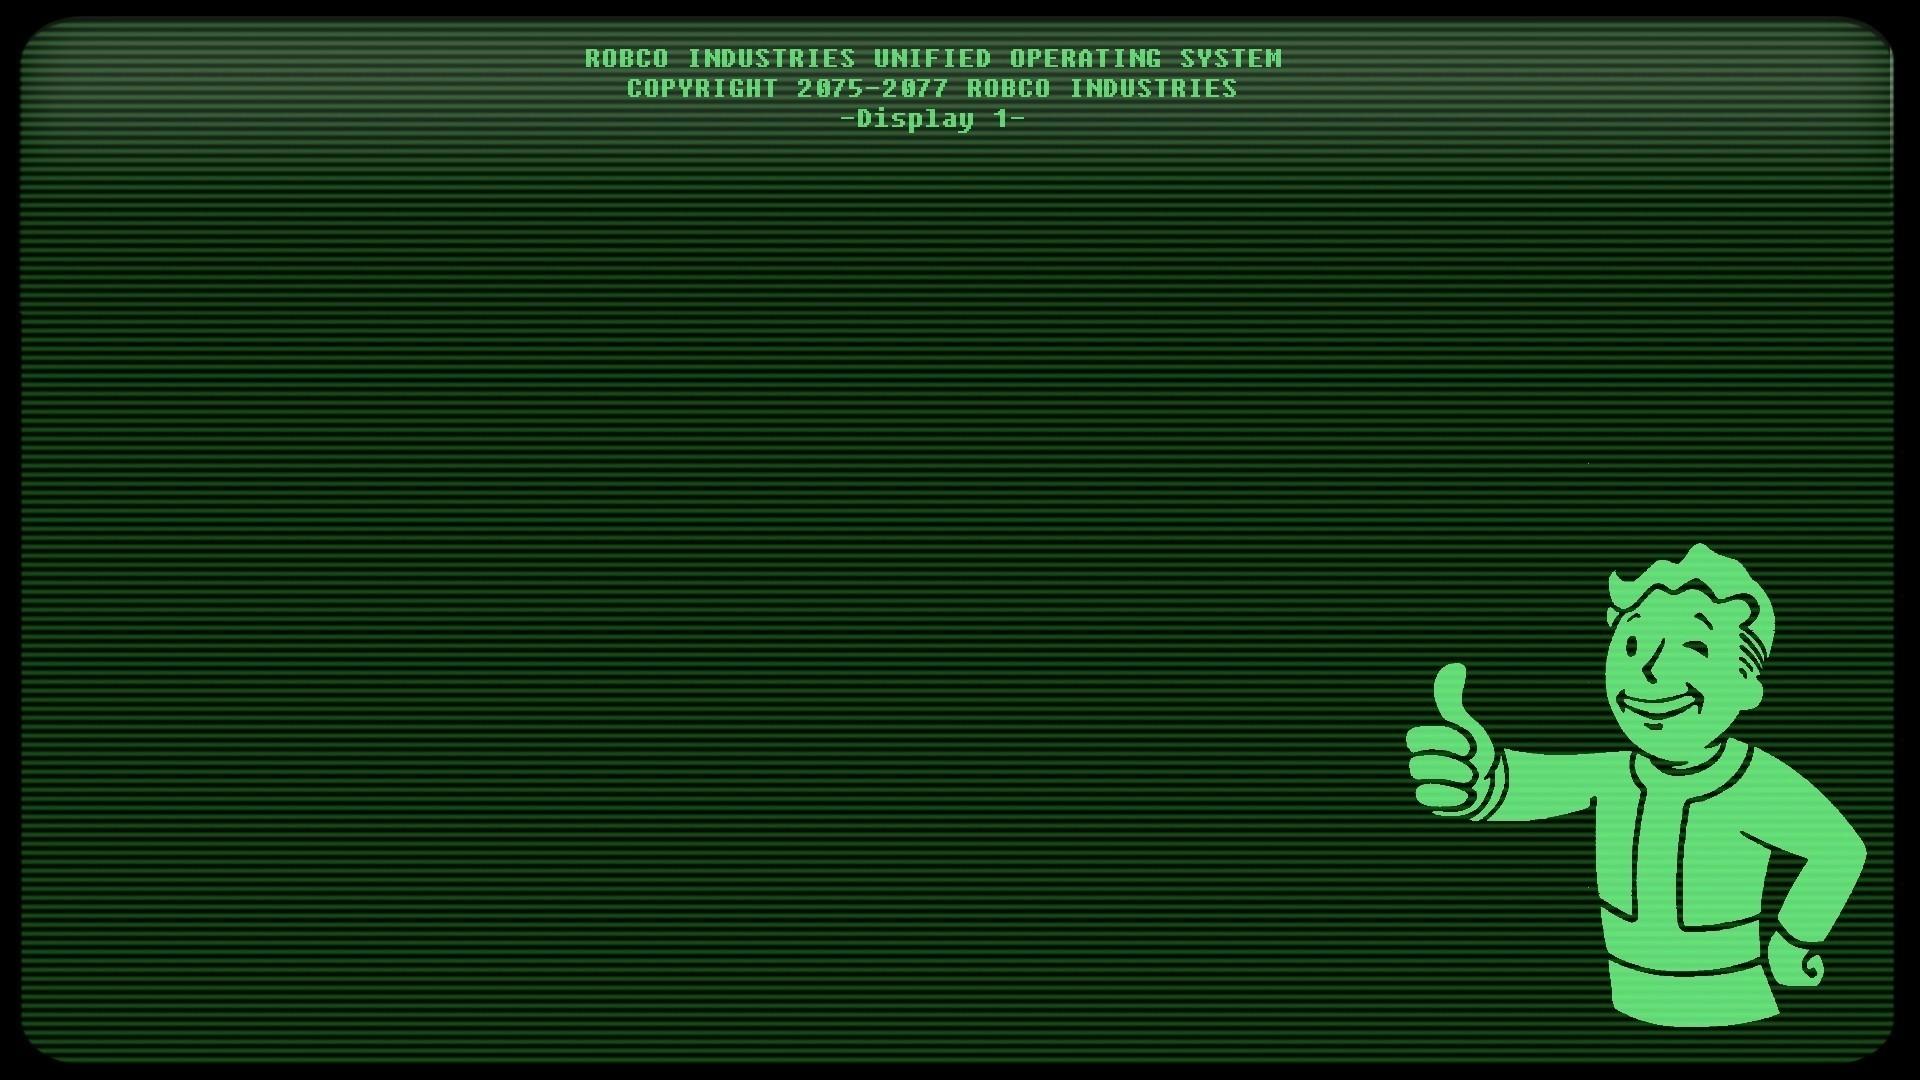 Fallout 4 Computer Wallpapers, Desktop Backgrounds